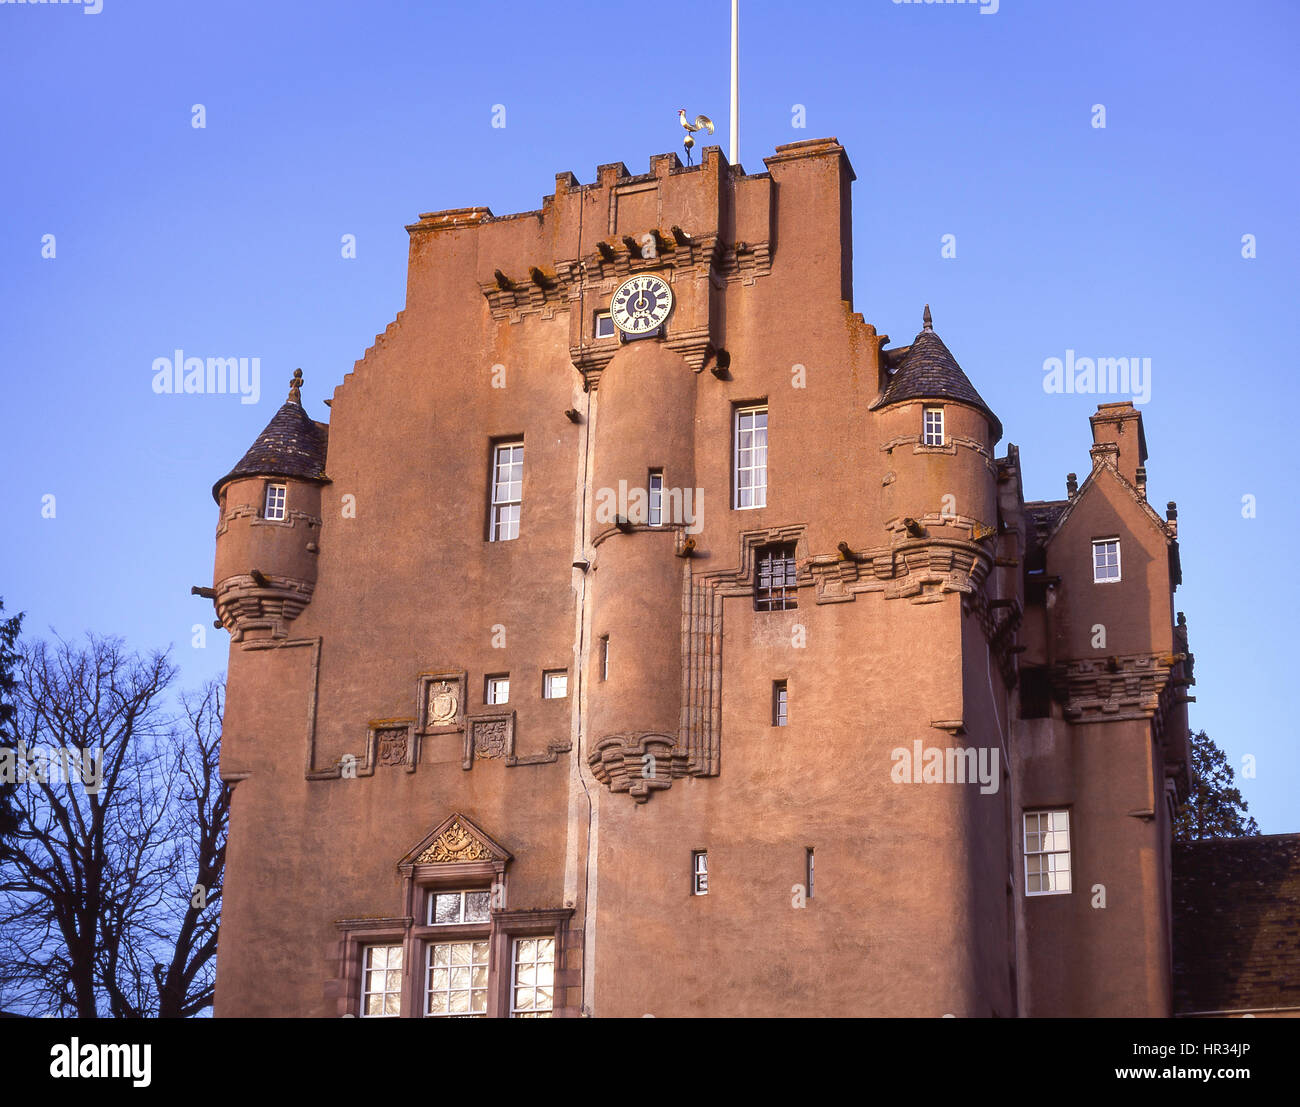 Castle Fraser at dusk, Kemnay, Aberdeenshire, Scotland, United Kingdom - Stock Image